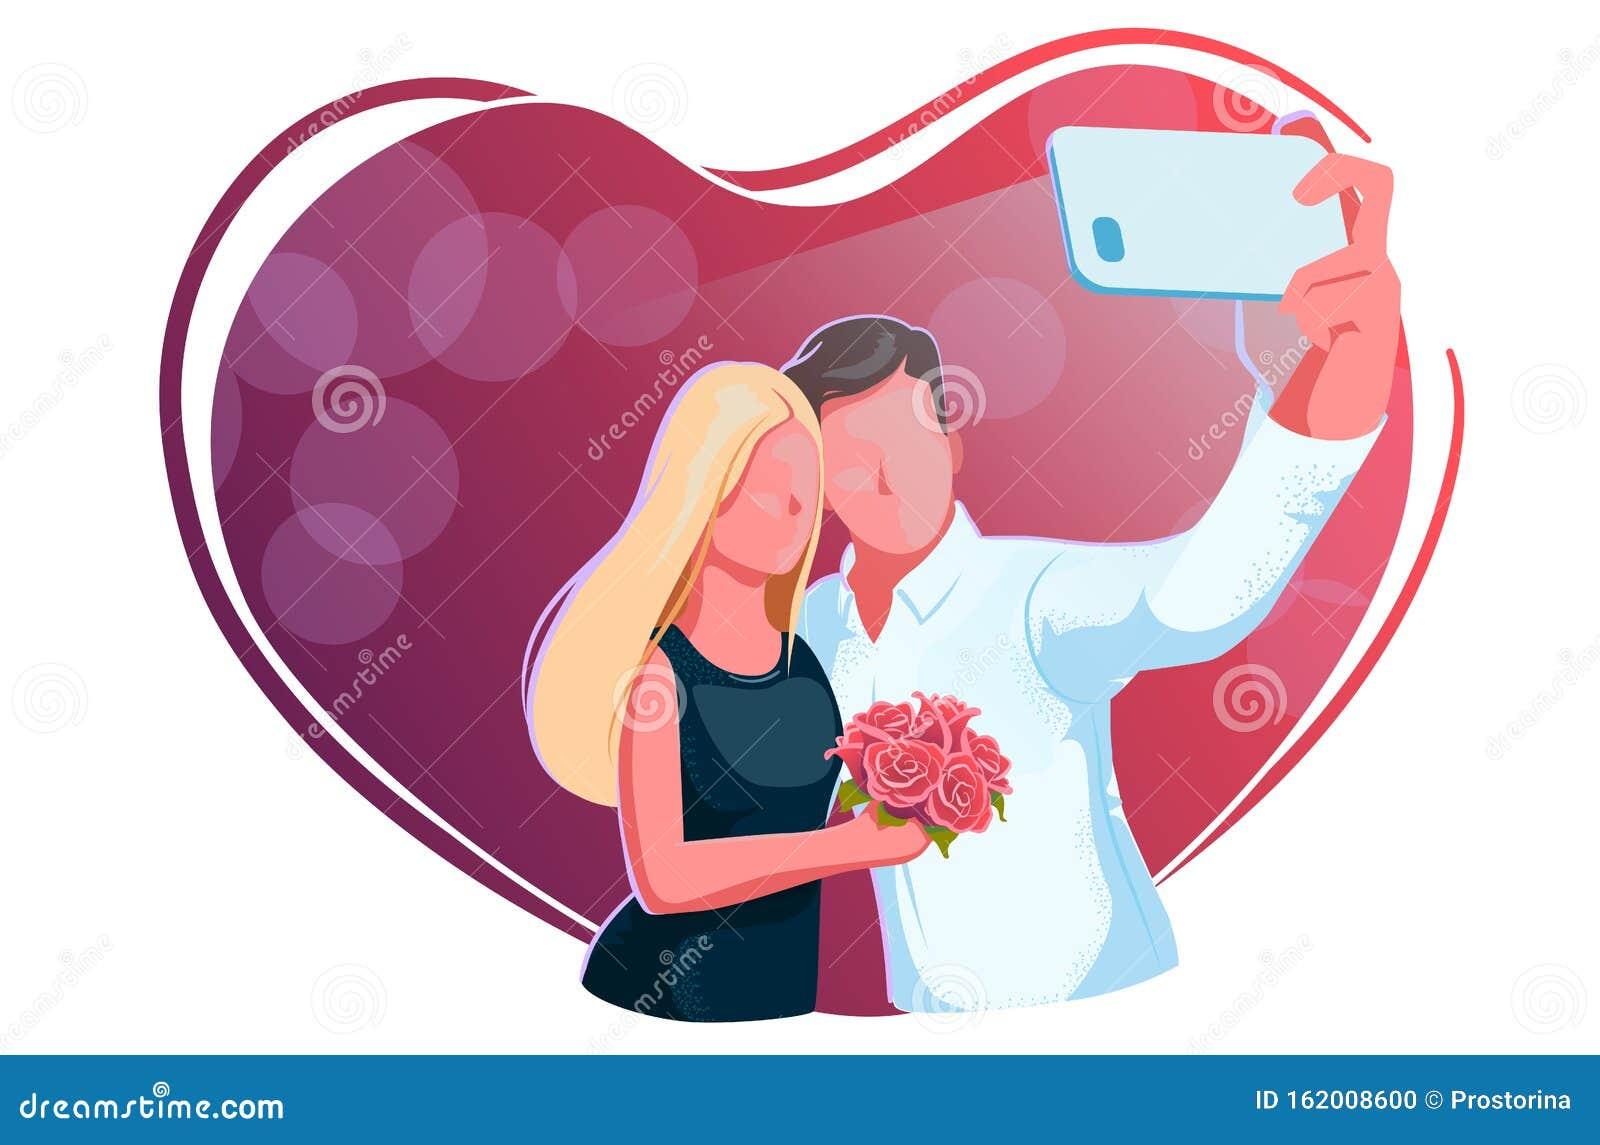 adolf fredrik romantisk dejt